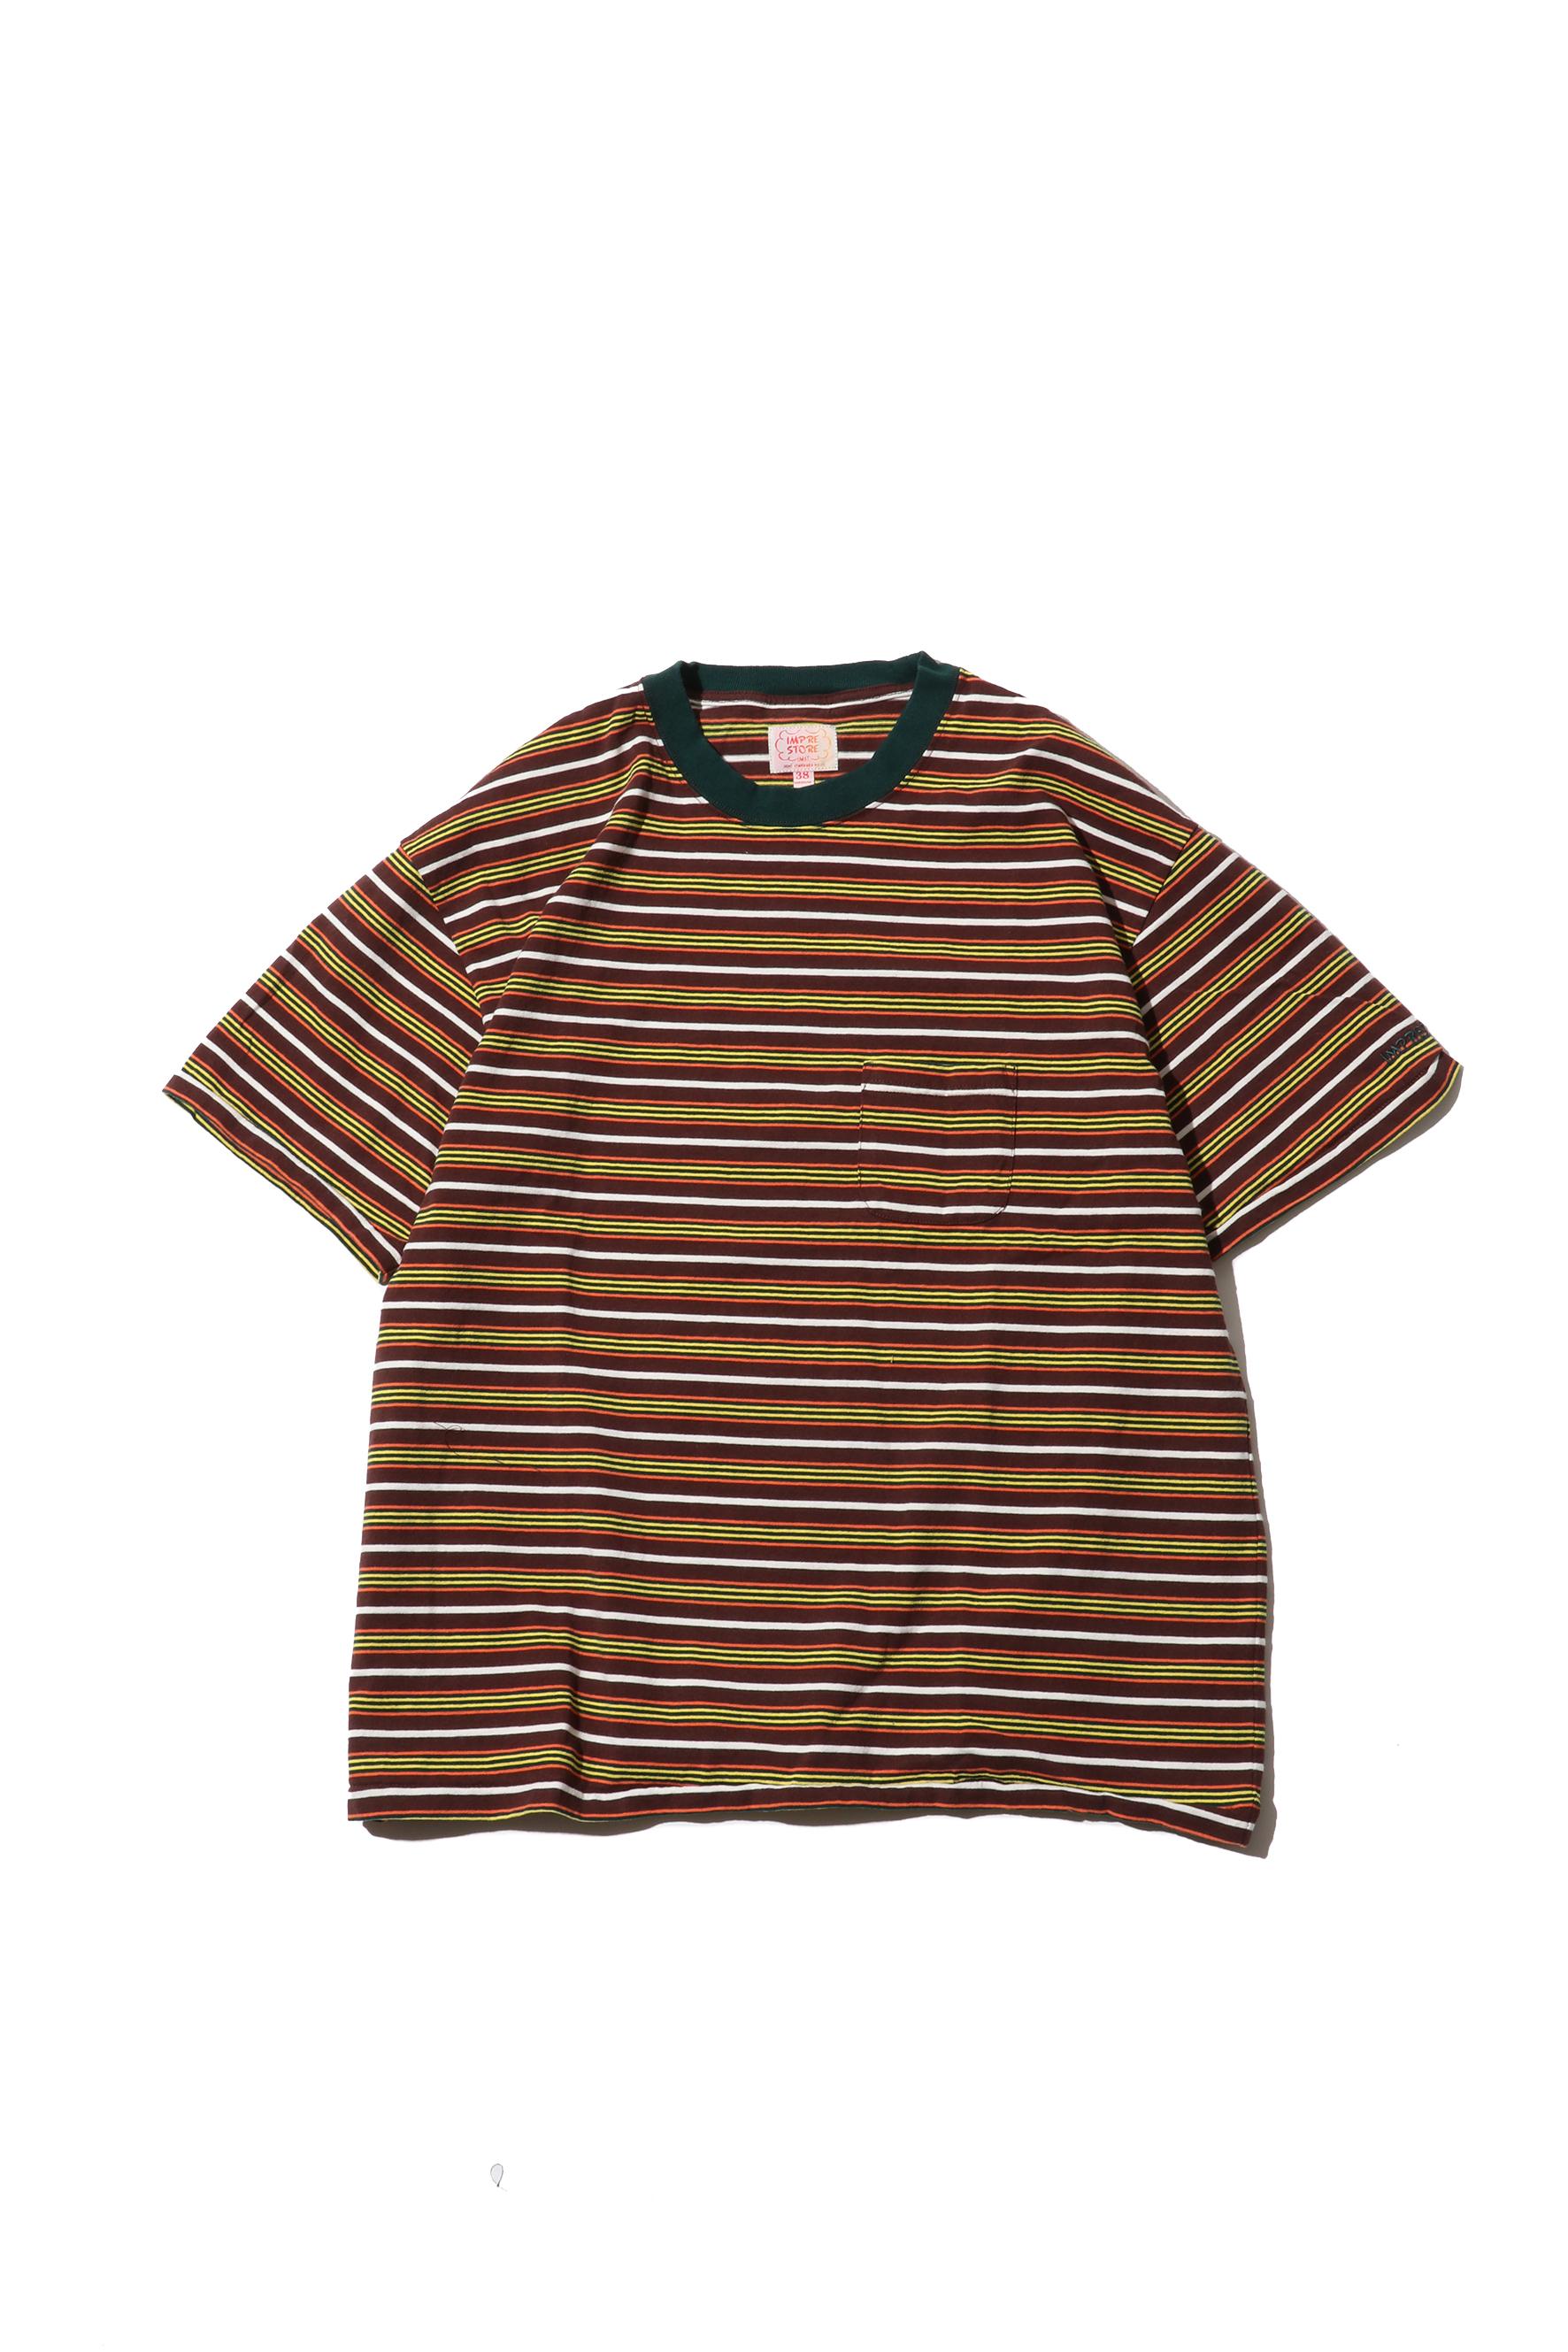 Original Multiborder Tshirt / brown